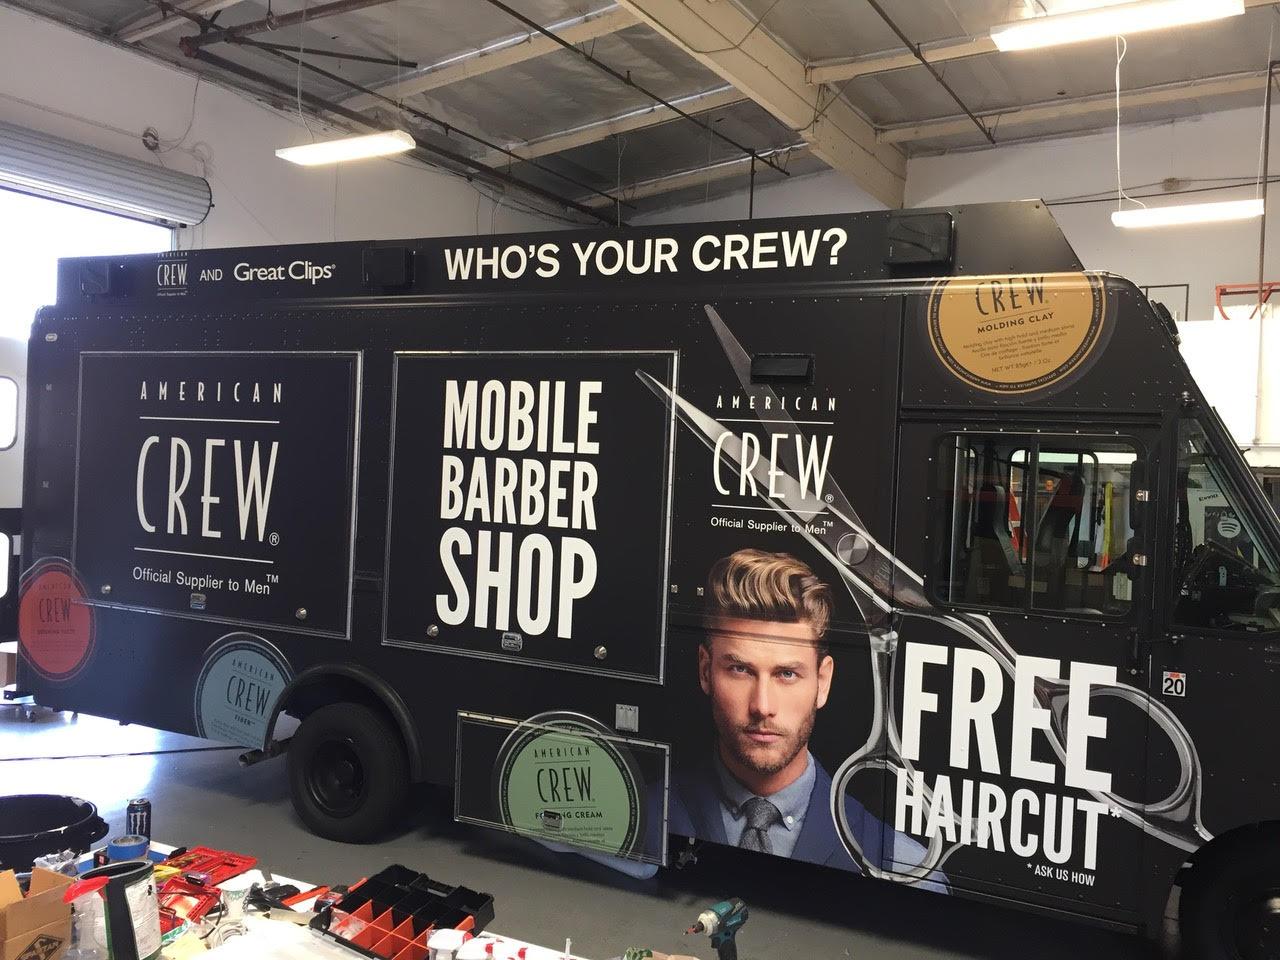 Crew hair salon truck